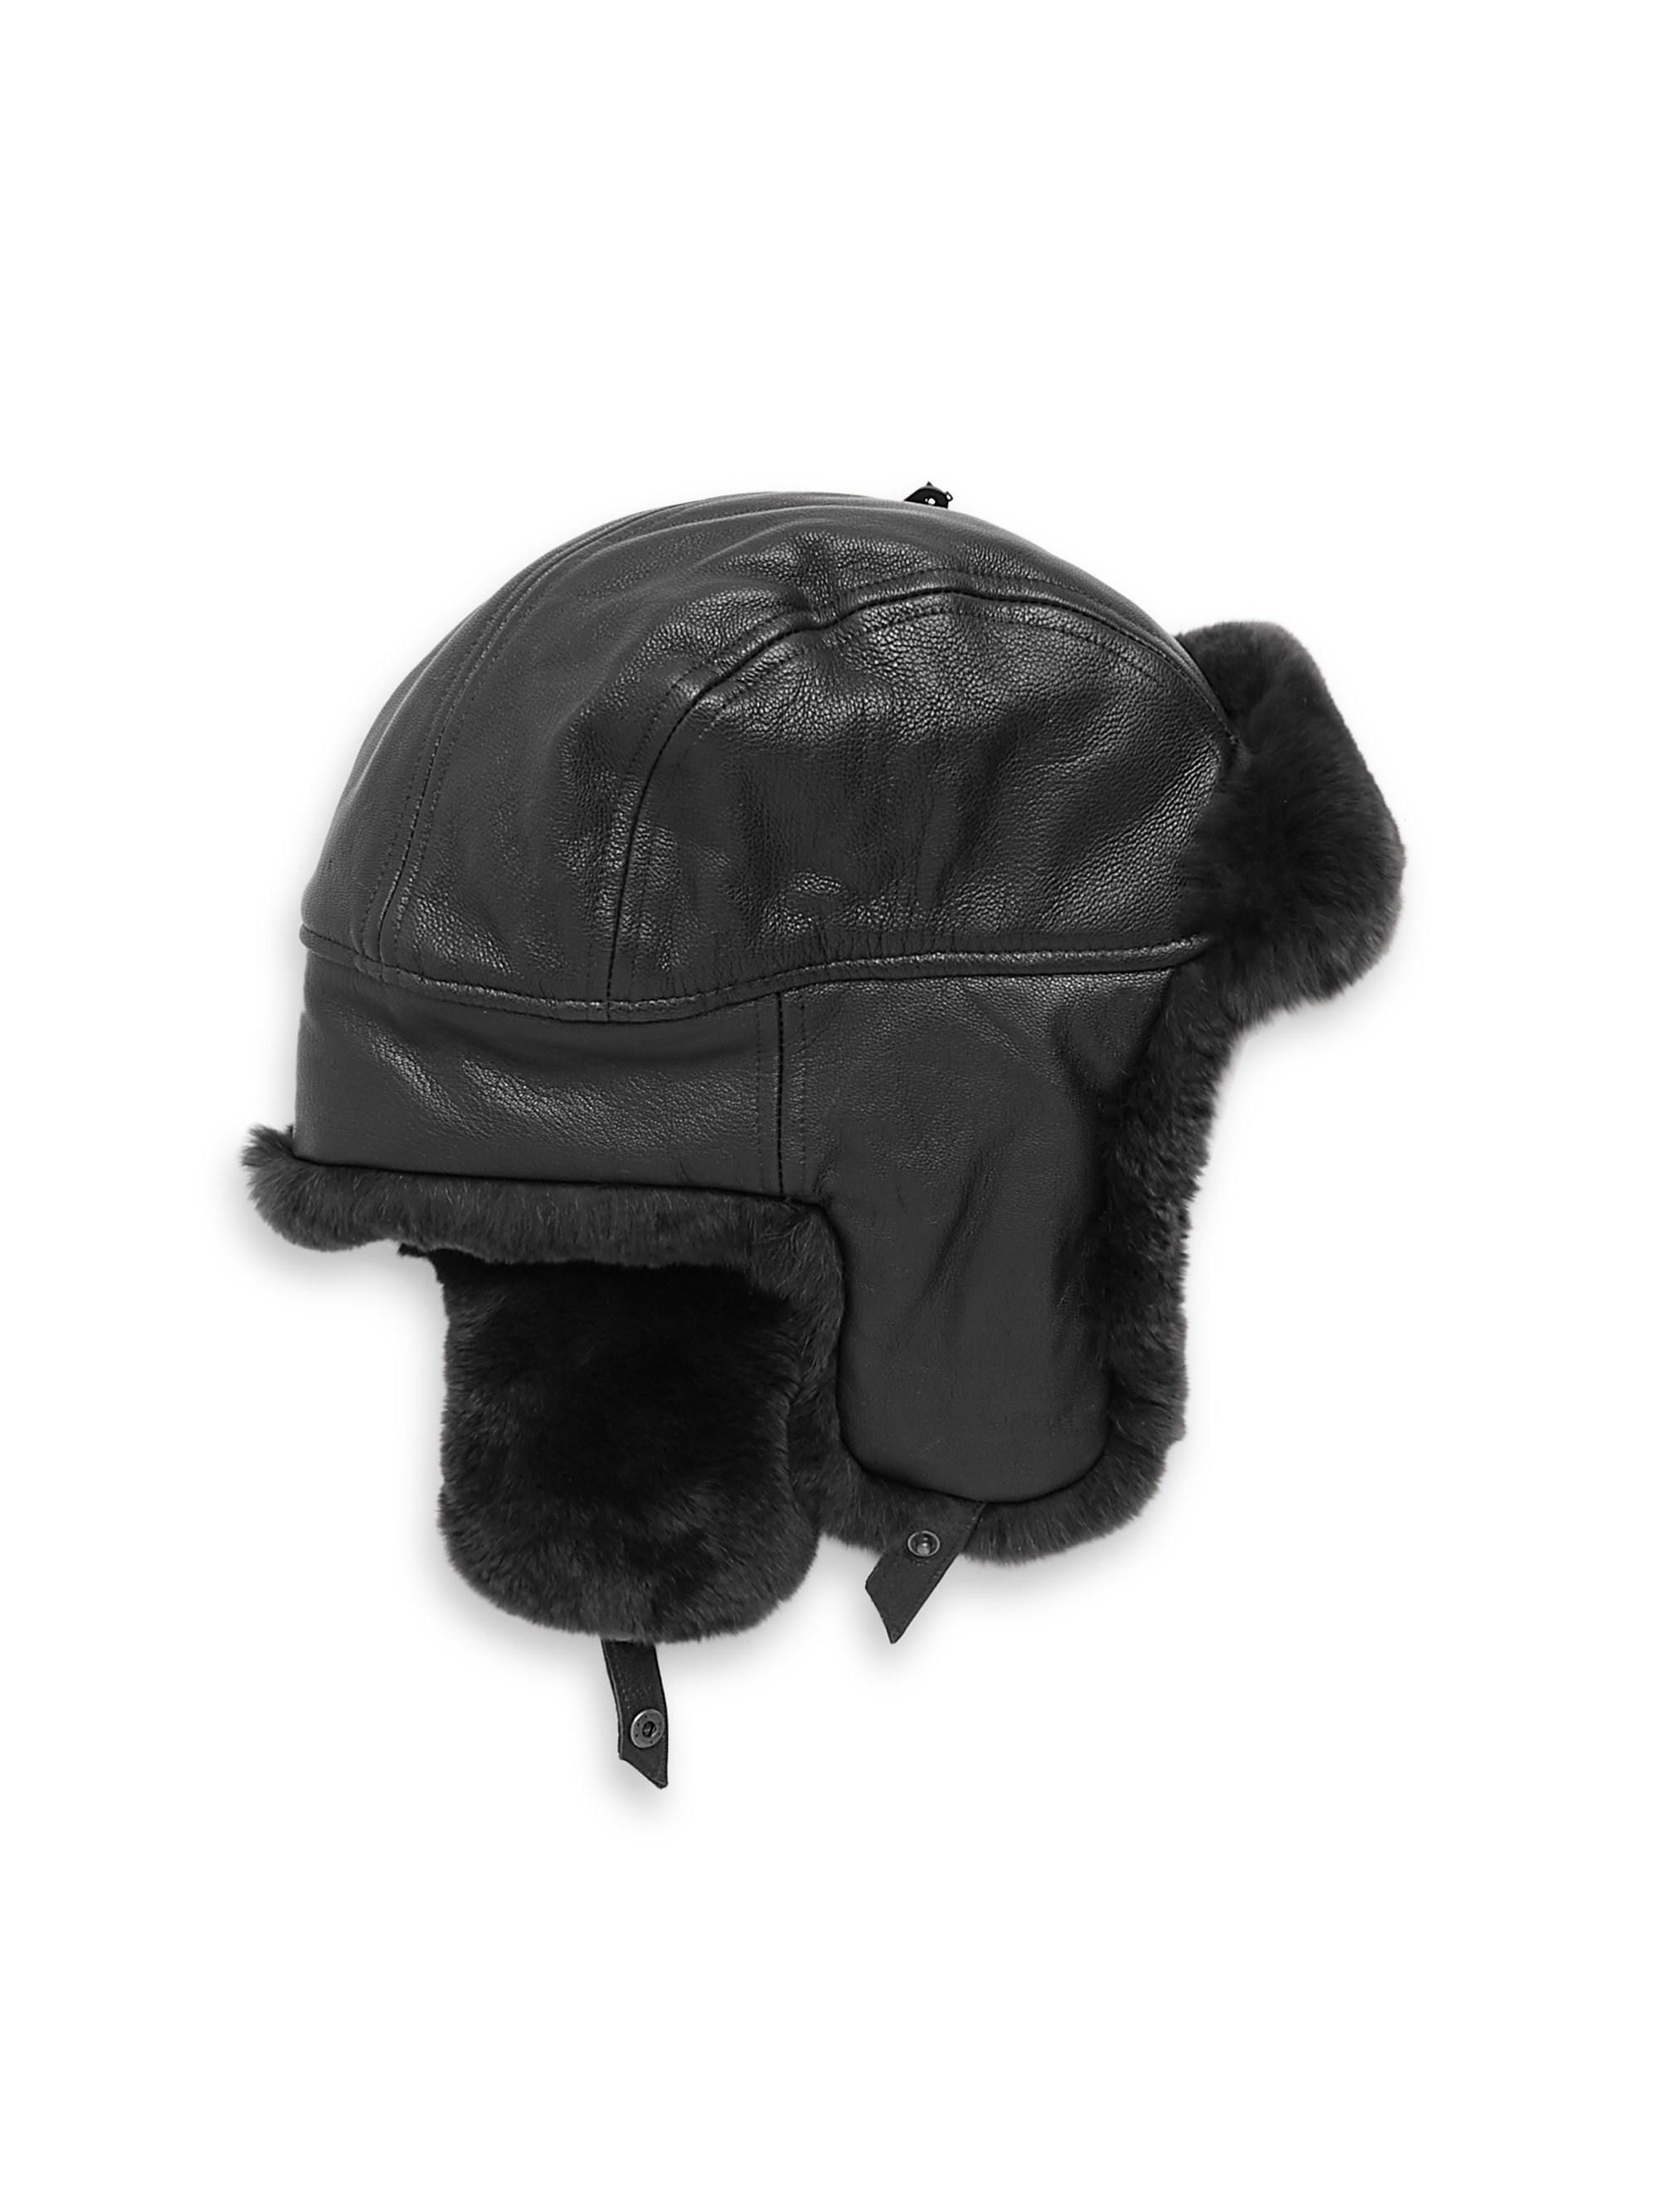 746a83bddcbee Crown Cap Sheared Rabbit Aviator Hat in Black for Men - Lyst